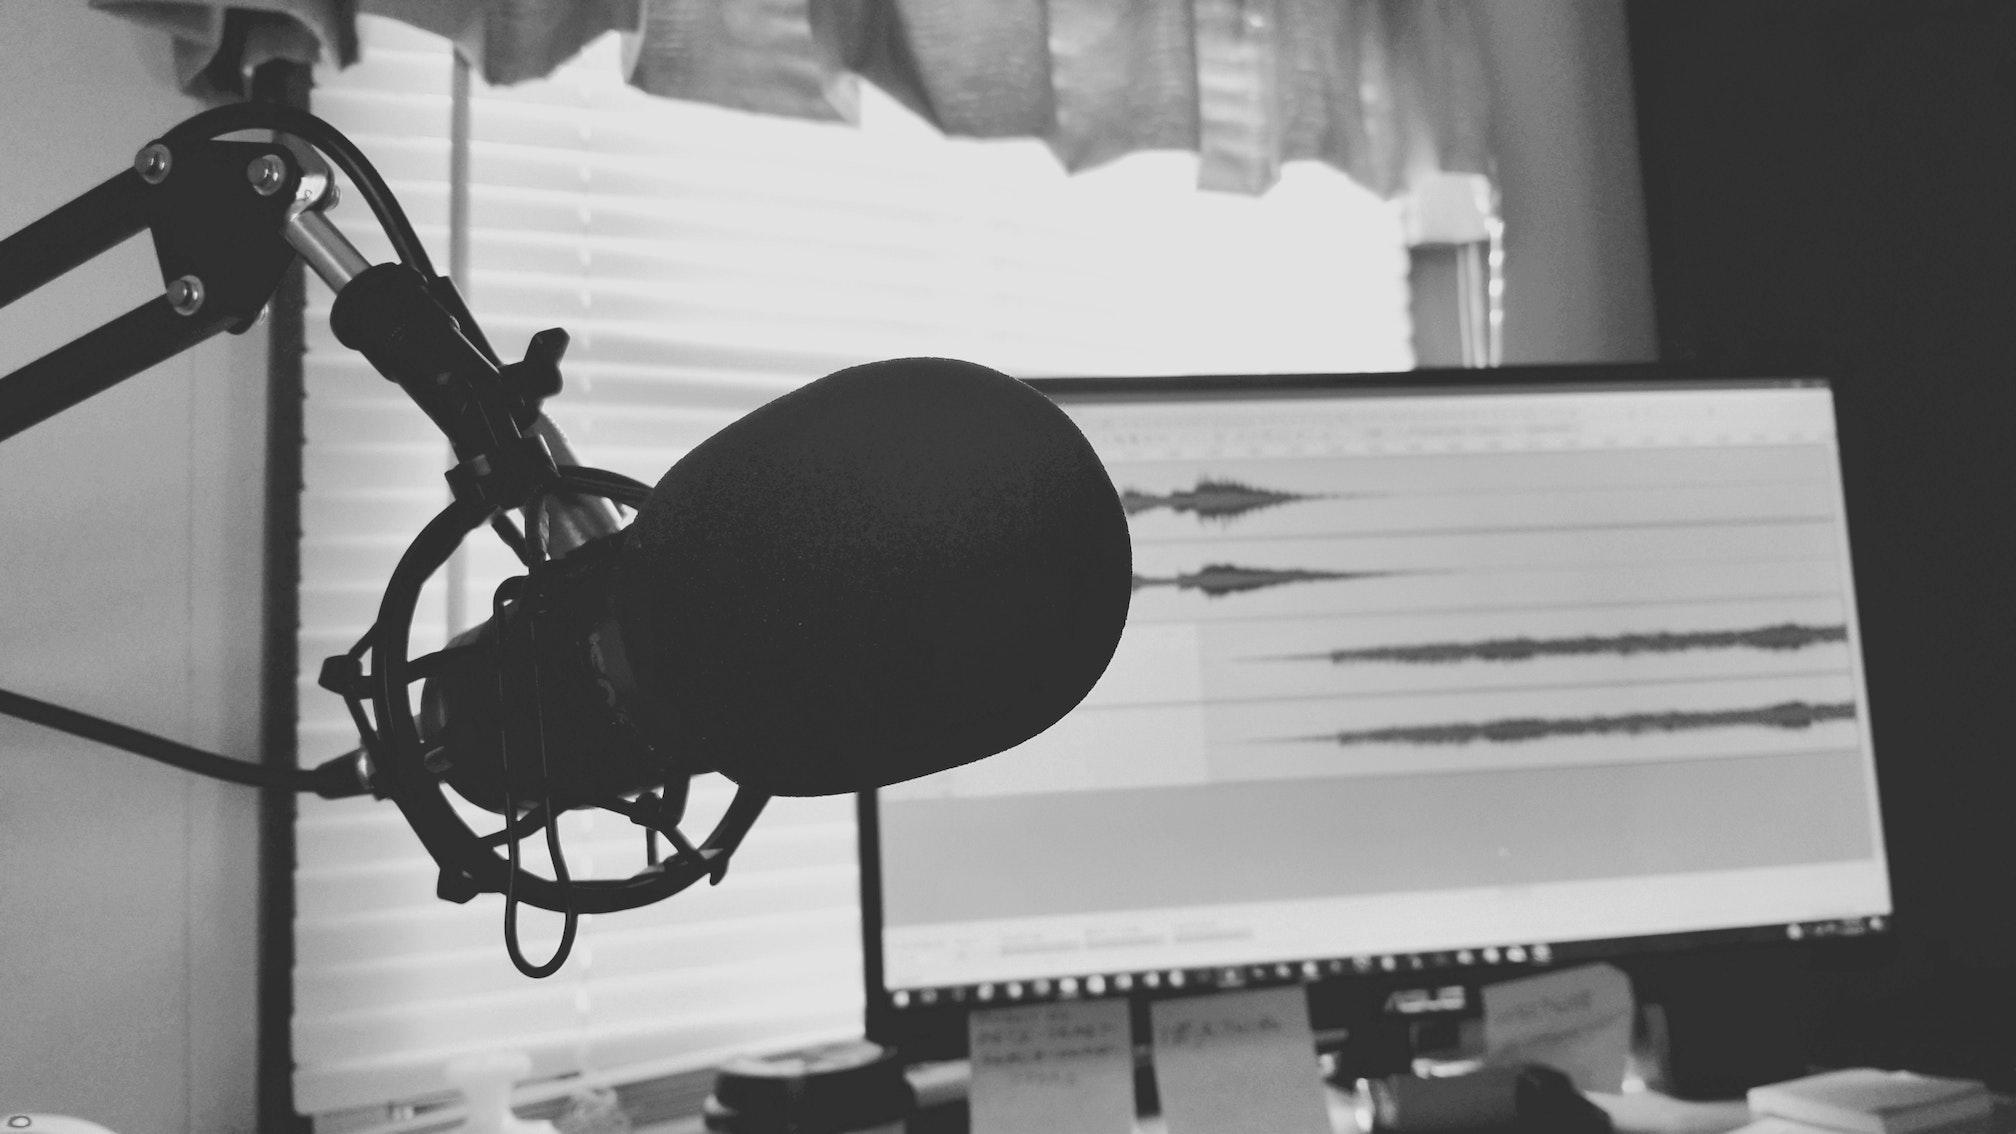 podcast mega-depth photo by Tommy Lopez (Pexels)